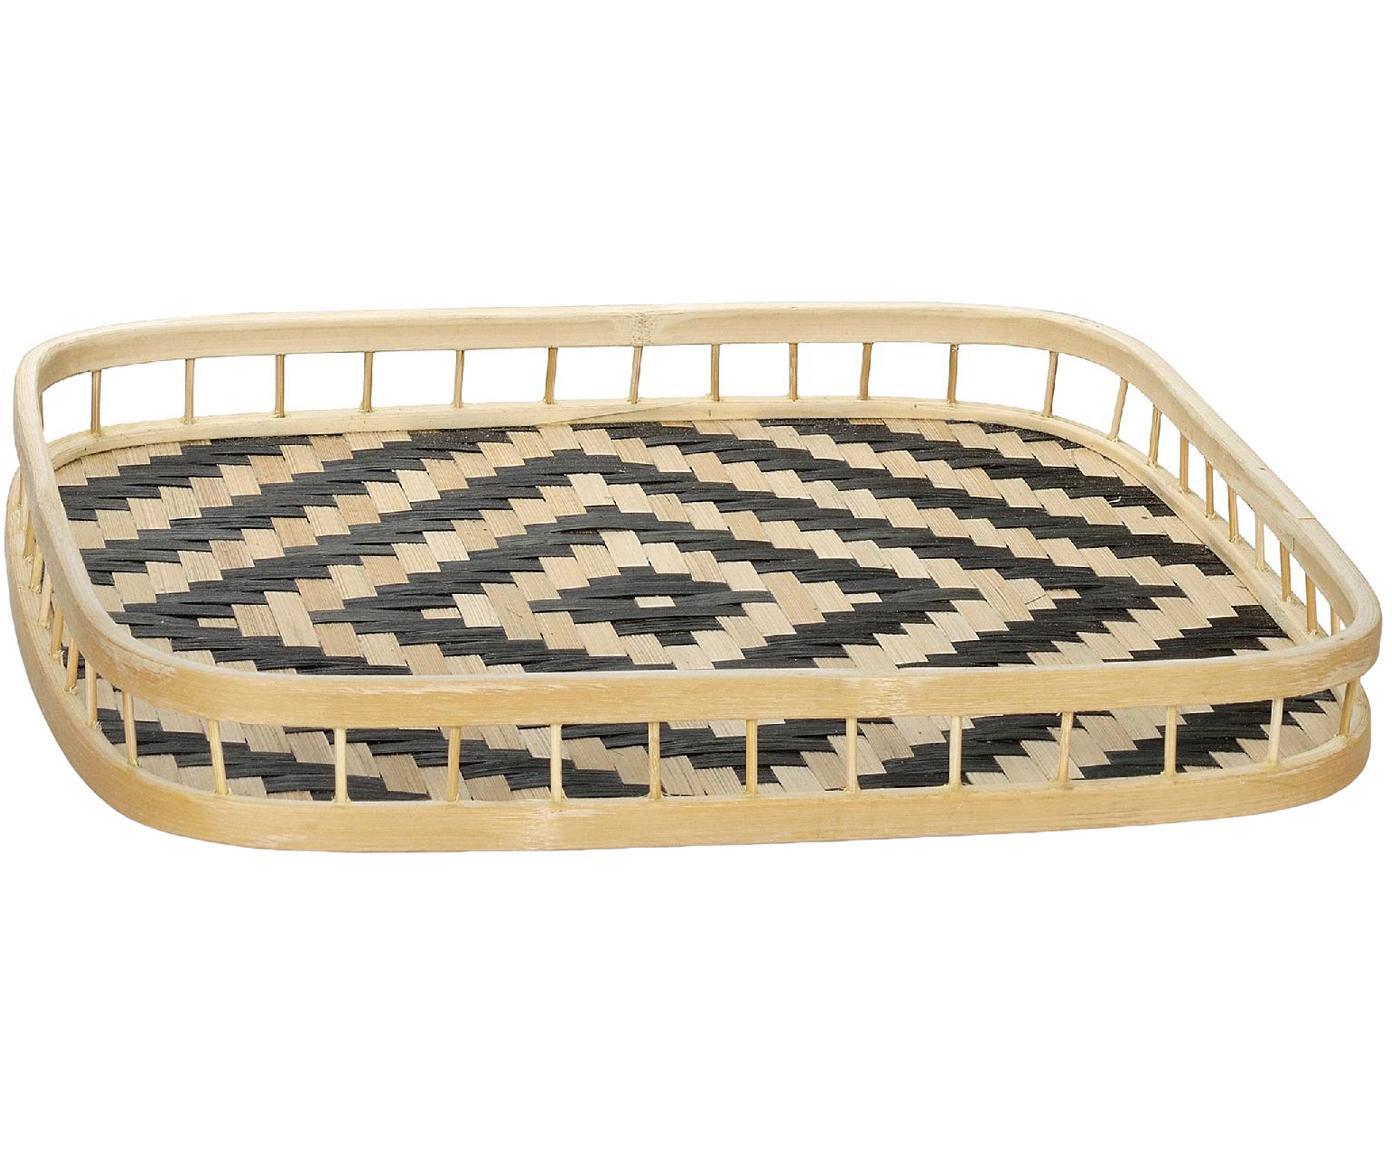 Deko-Tablett Rhombus, Bambus, Beige, Schwarz, B 32 x T 32 cm